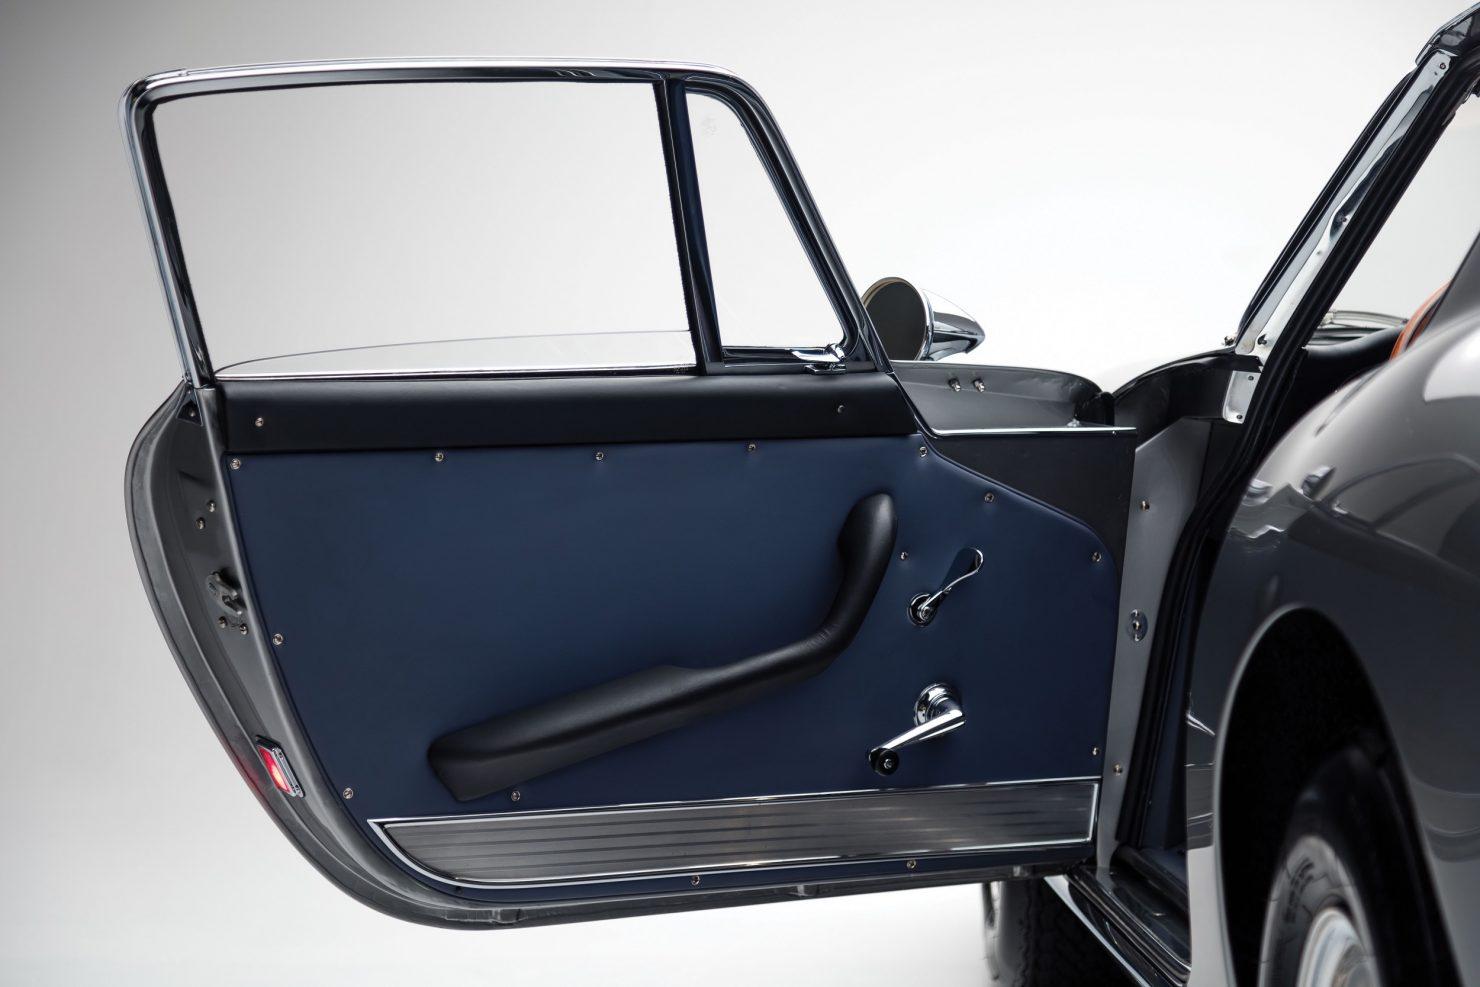 ferrari 275 gtb car 13 1480x987 - 1965 Ferrari 275 GTB/6C Alloy